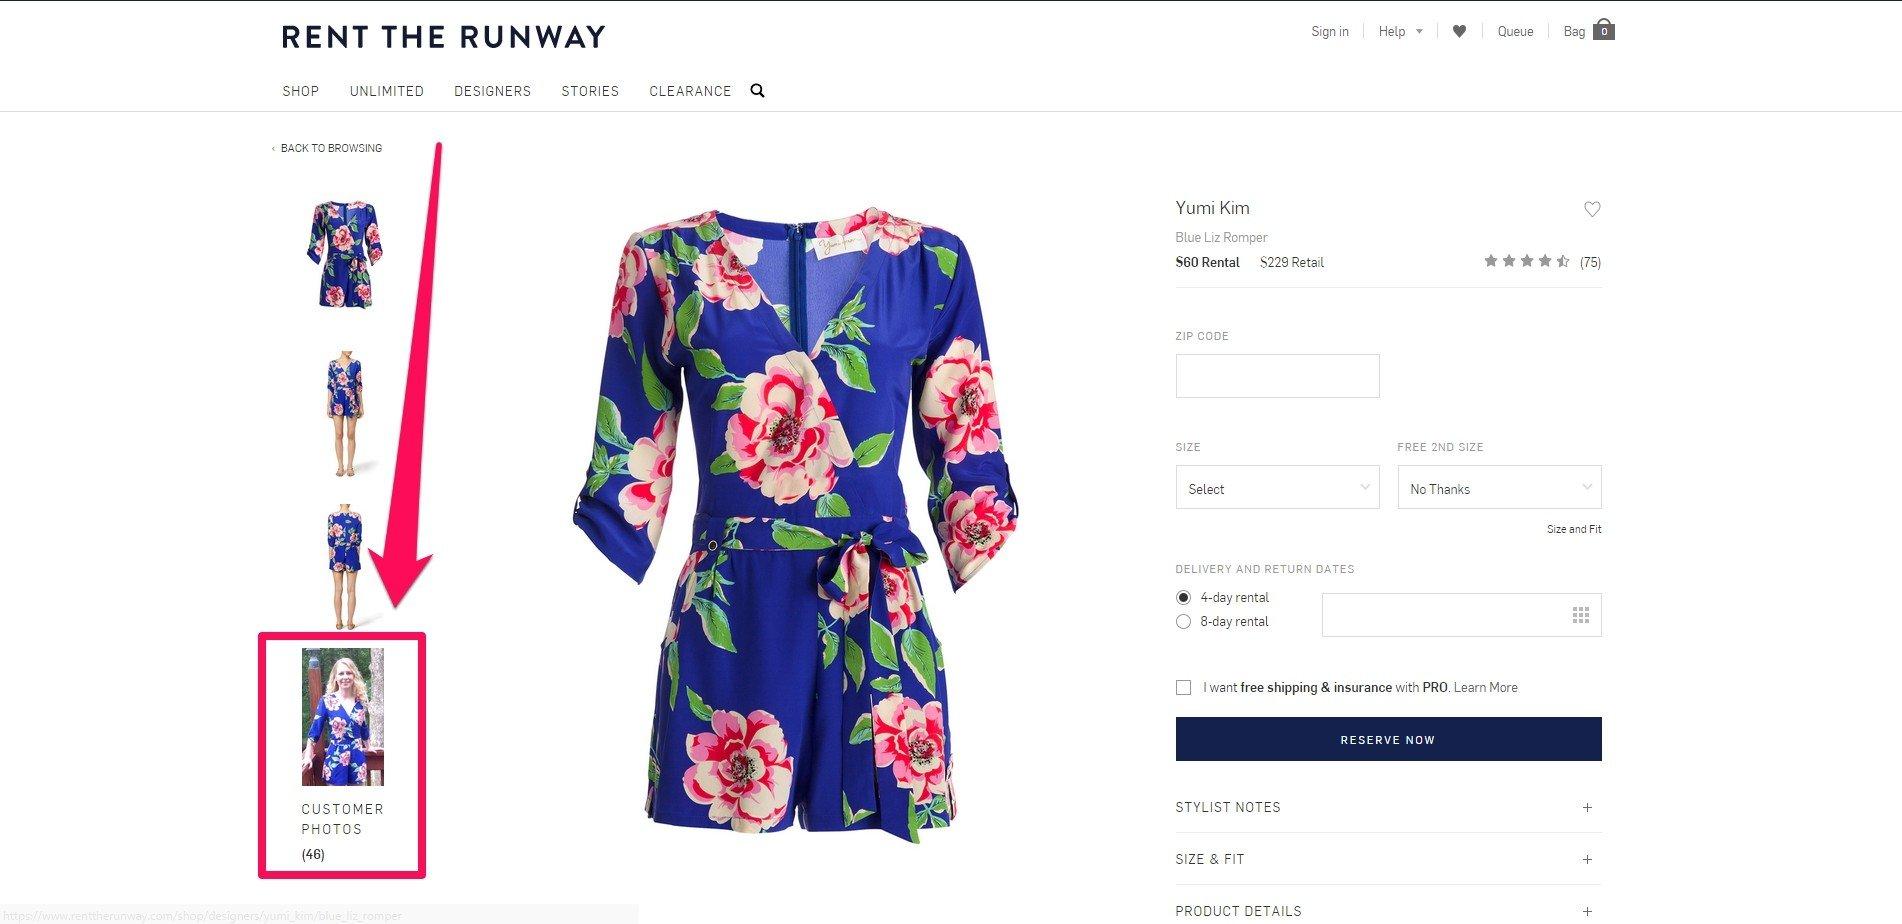 rent the runway's customer photos image